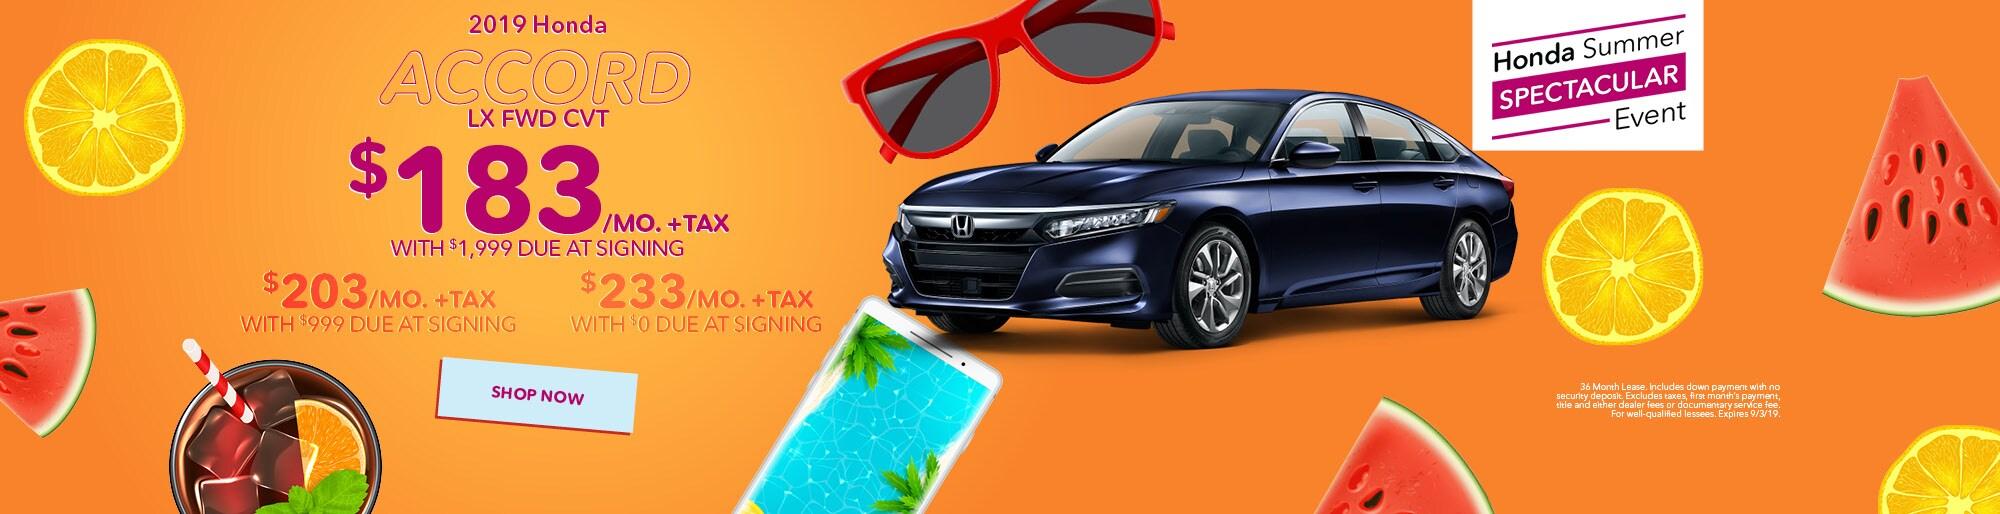 Car Dealers With No Dealer Fees >> Honda West In Las Vegas New Honda Used Car Dealership